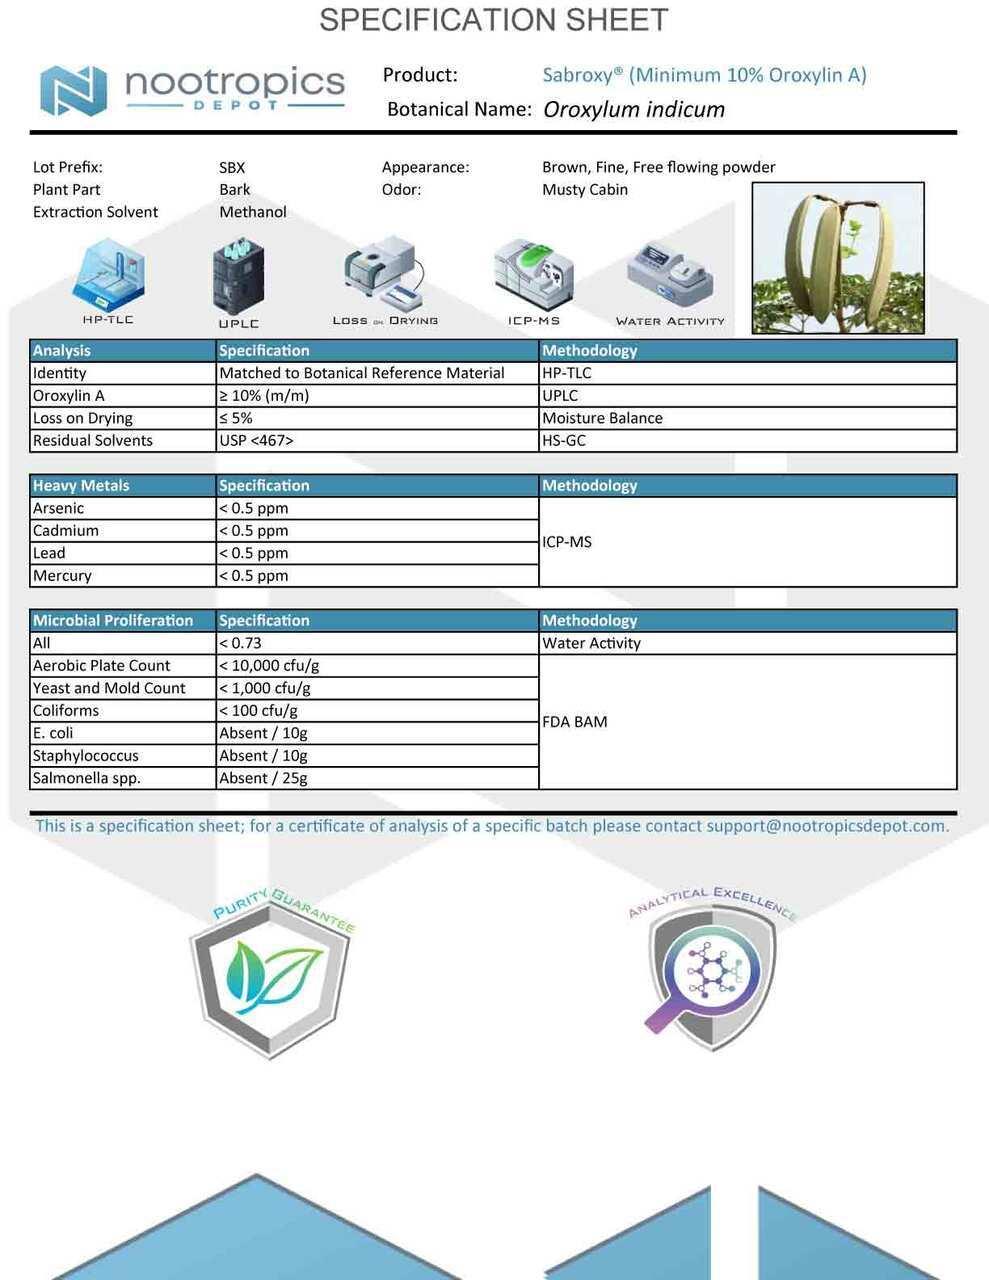 Sabroxy Spec Sheet